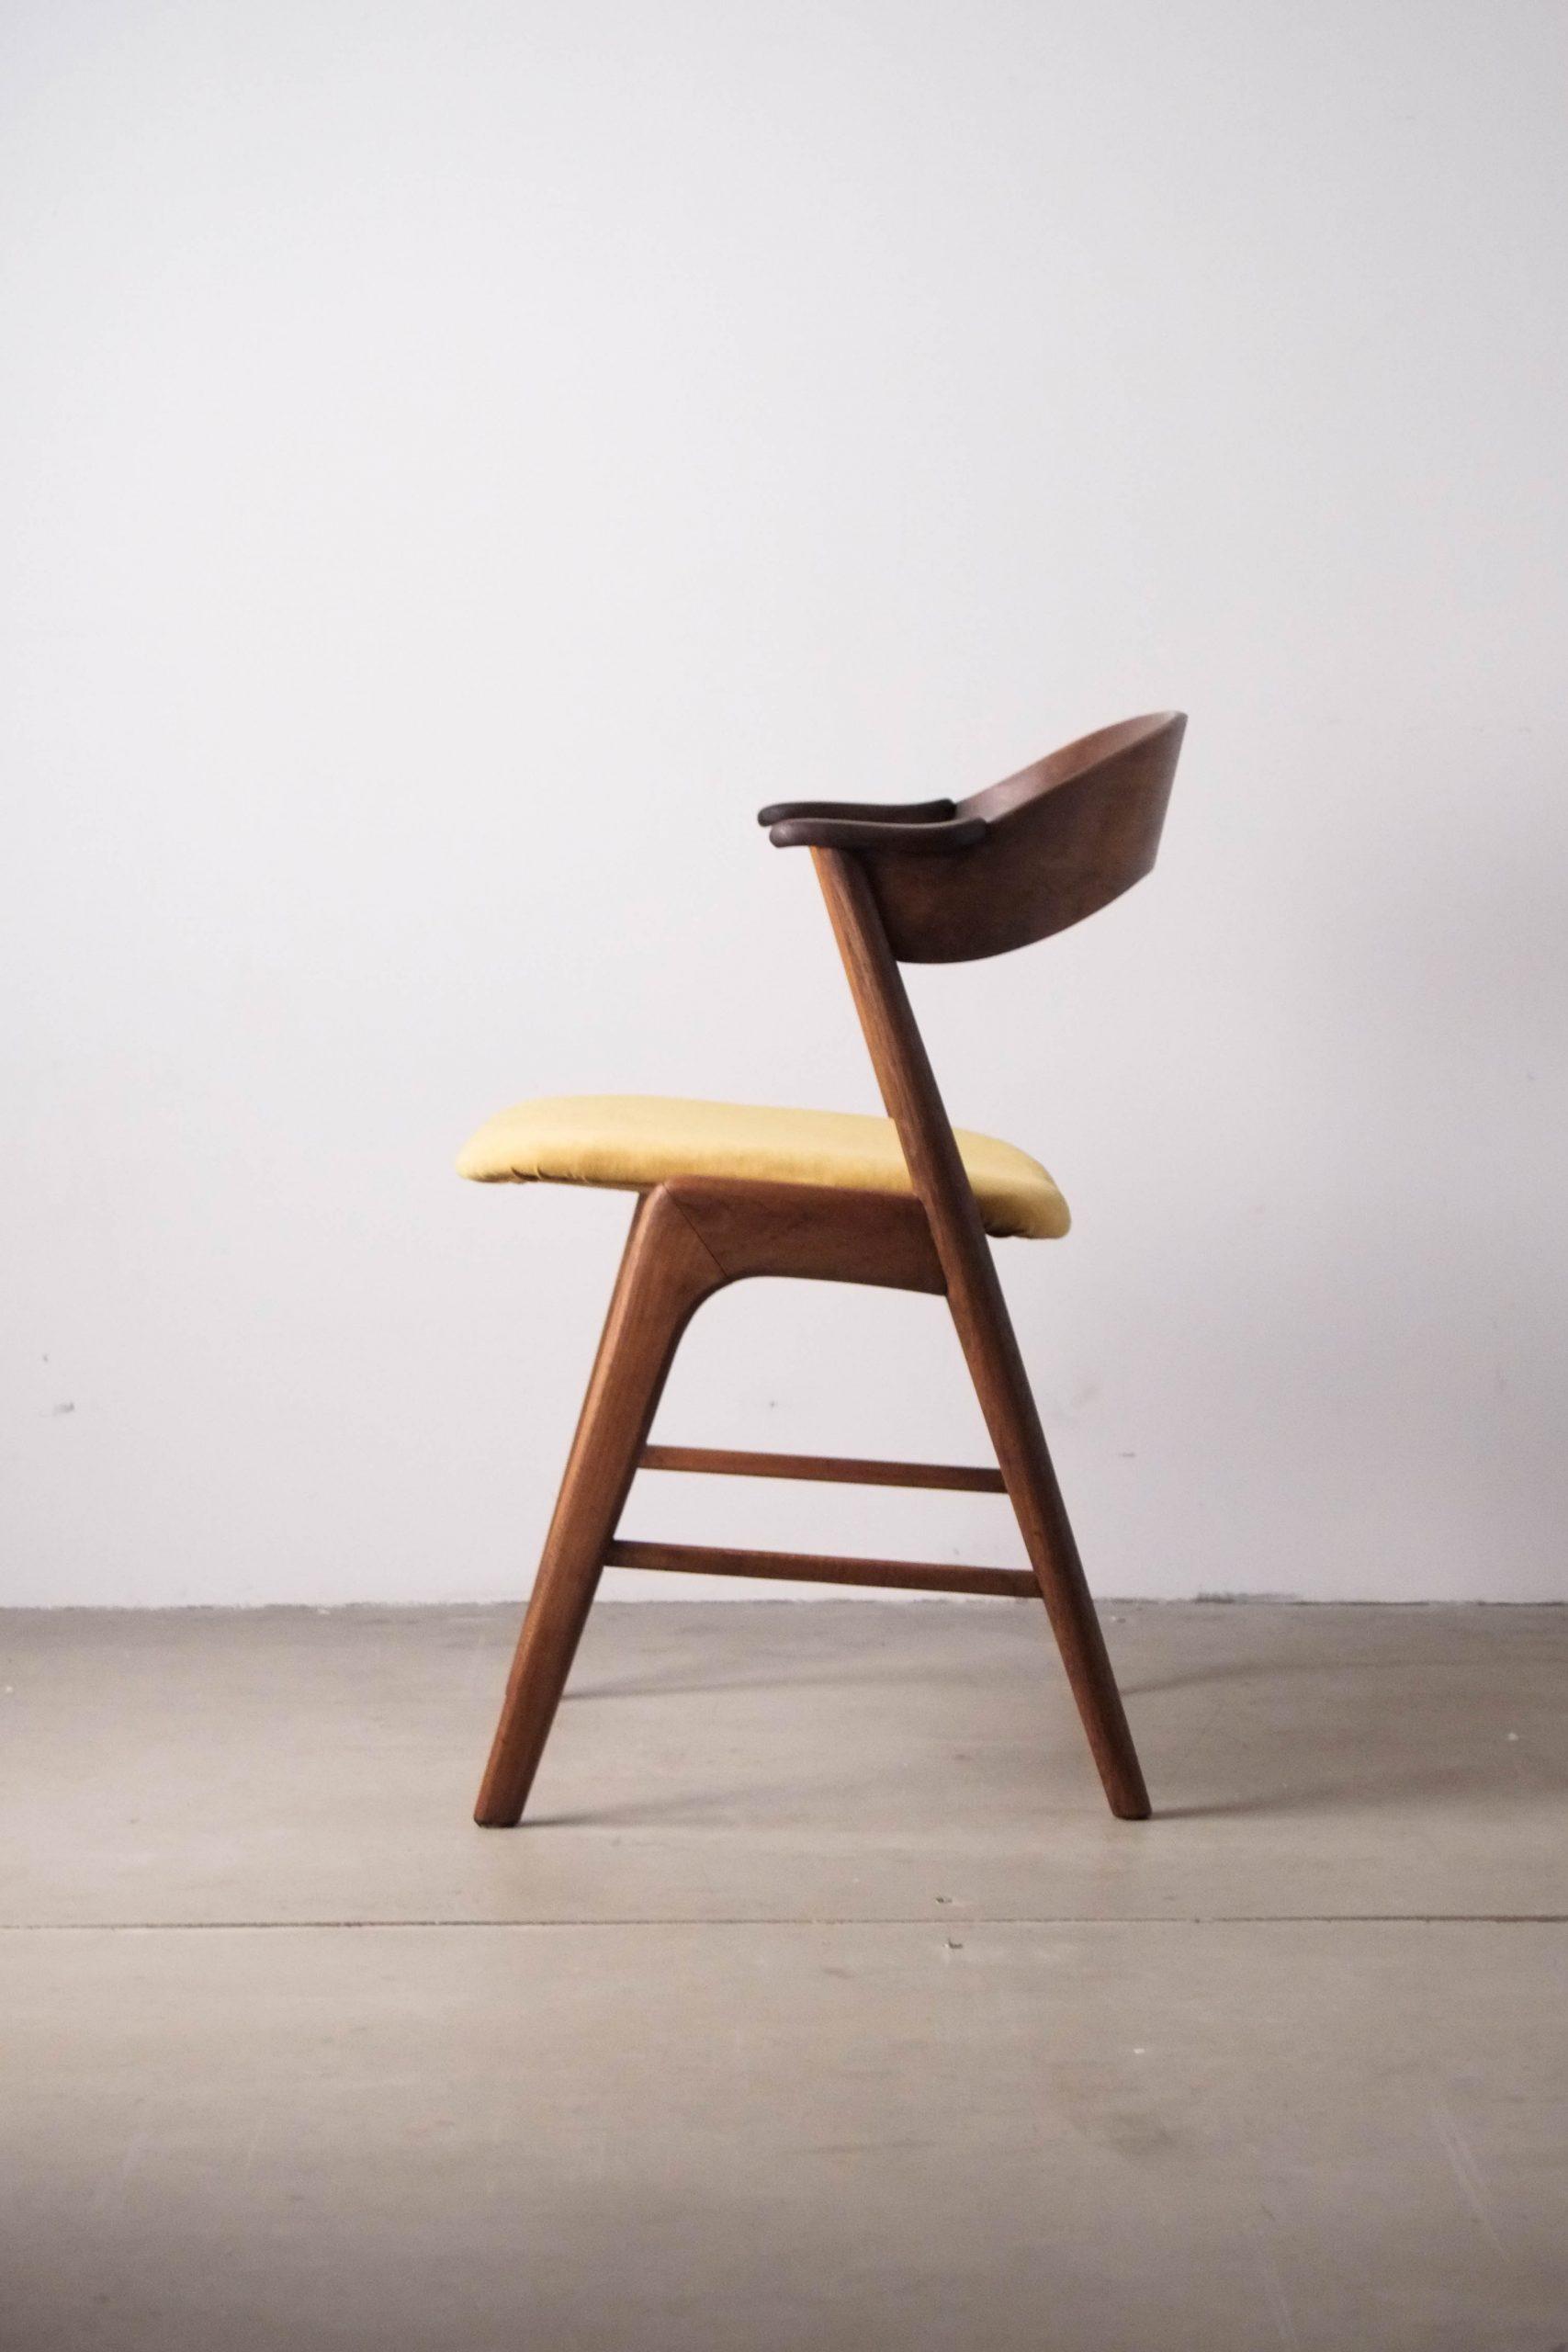 diseño silla de diseño estructura madera maciza natural fabricada dinamarca mid century